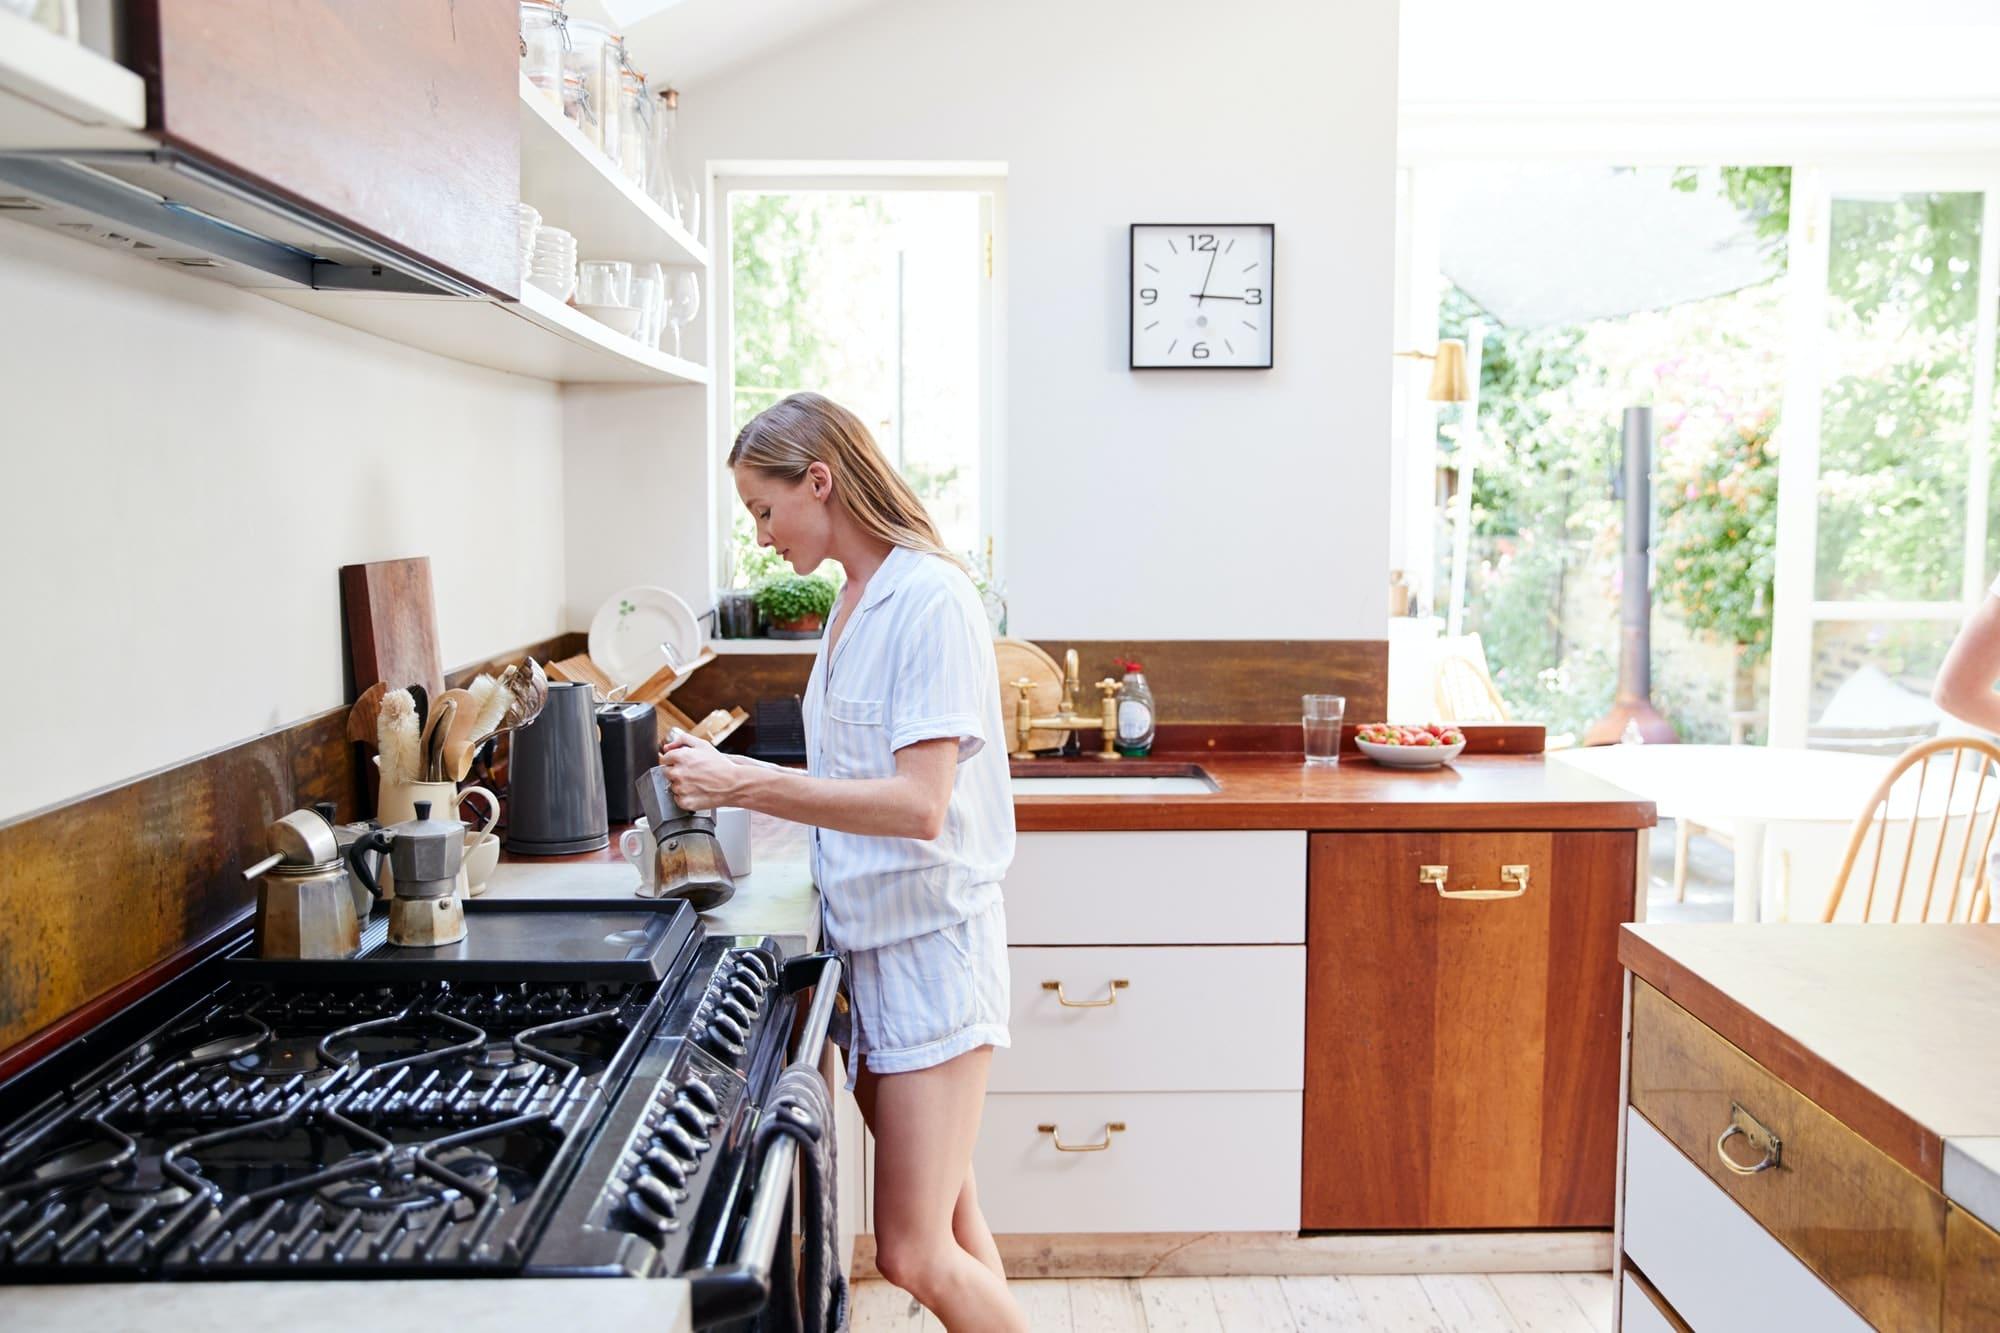 Woman Wearing Pajamas At Home In Kitchen Making Fresh Coffee